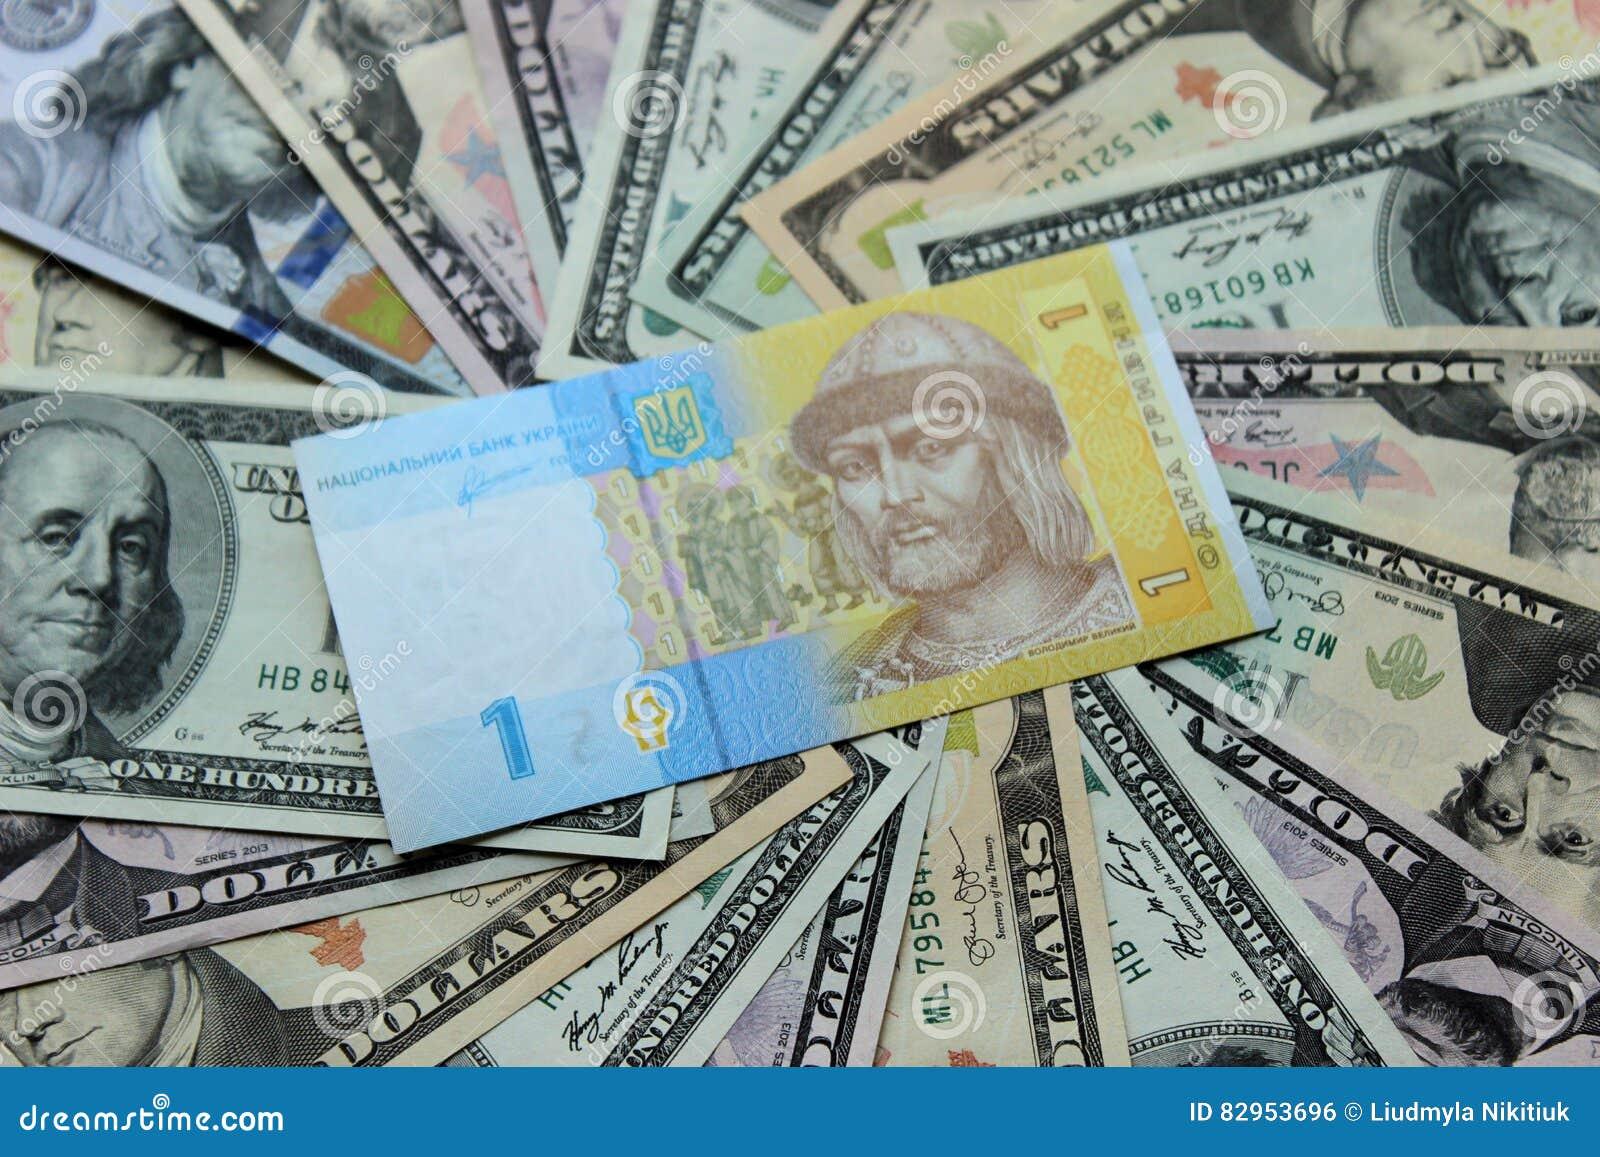 Ukrainian hryvnia and dollar bills. Money background